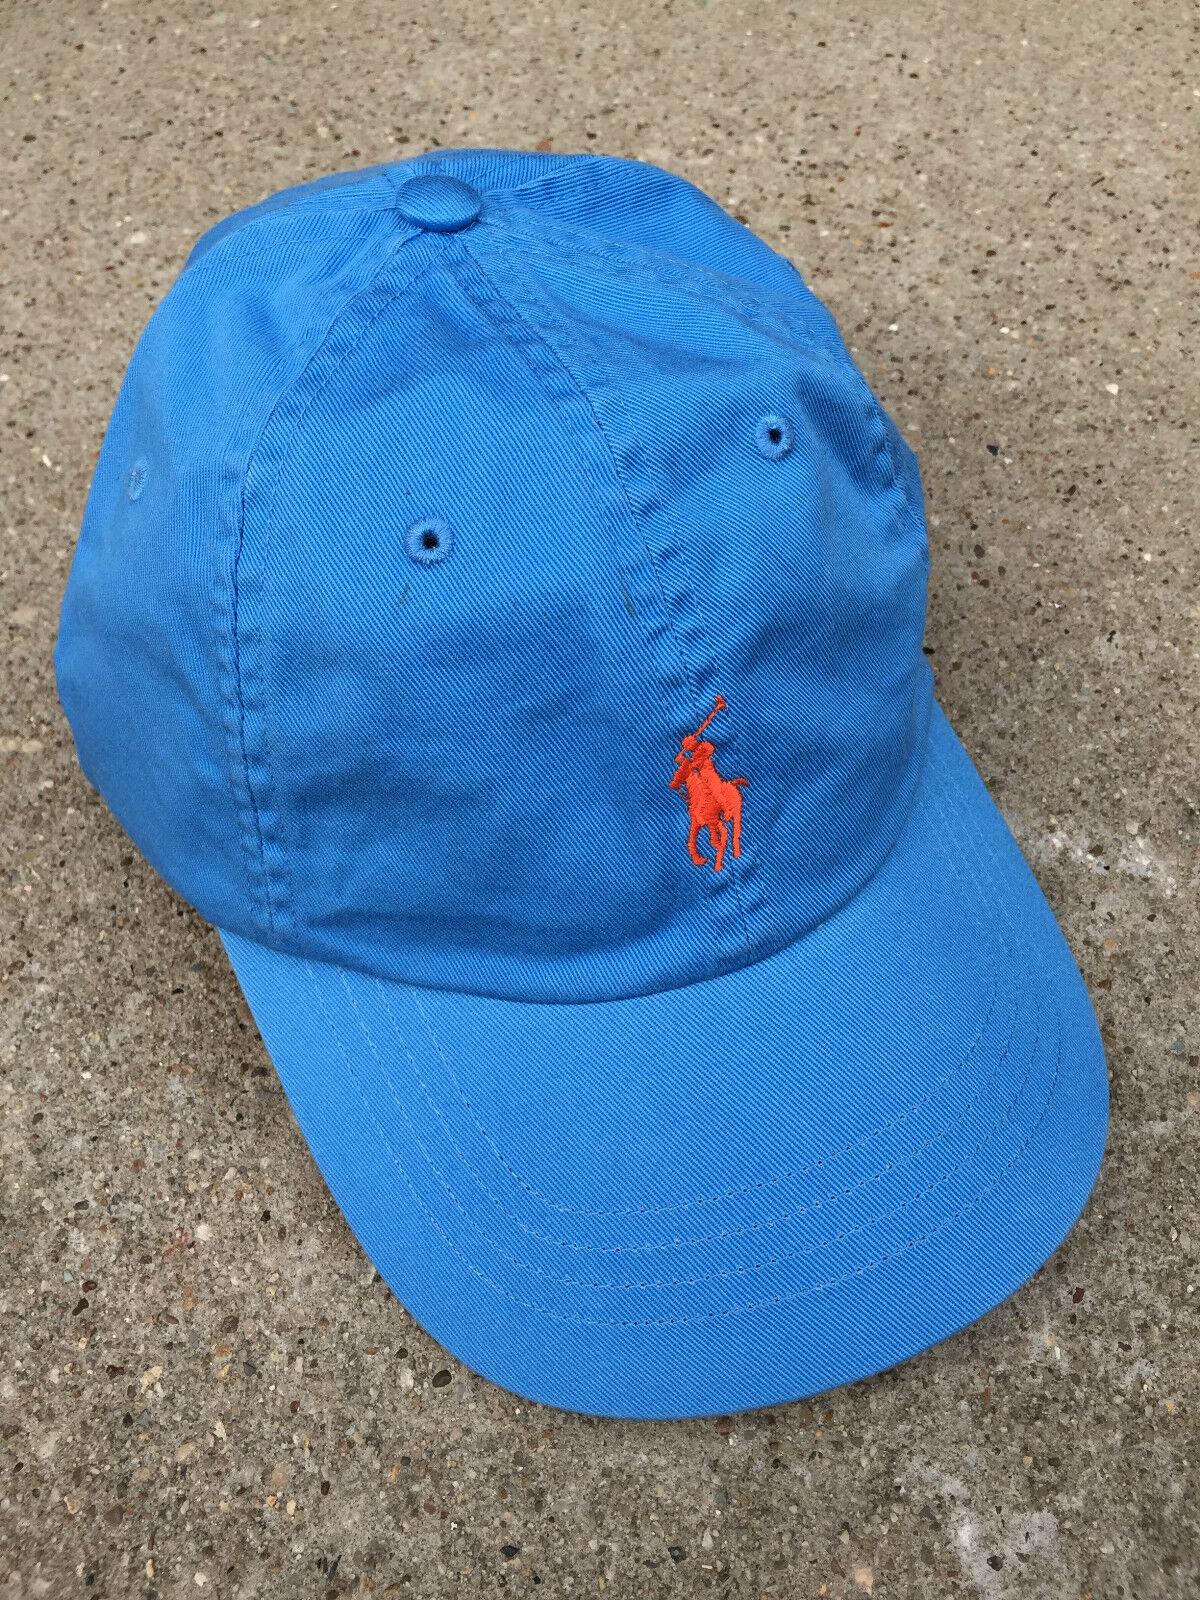 NEW Polo Ralph Lauren Baseball Cap Hat Big Pony Adjustable Strap